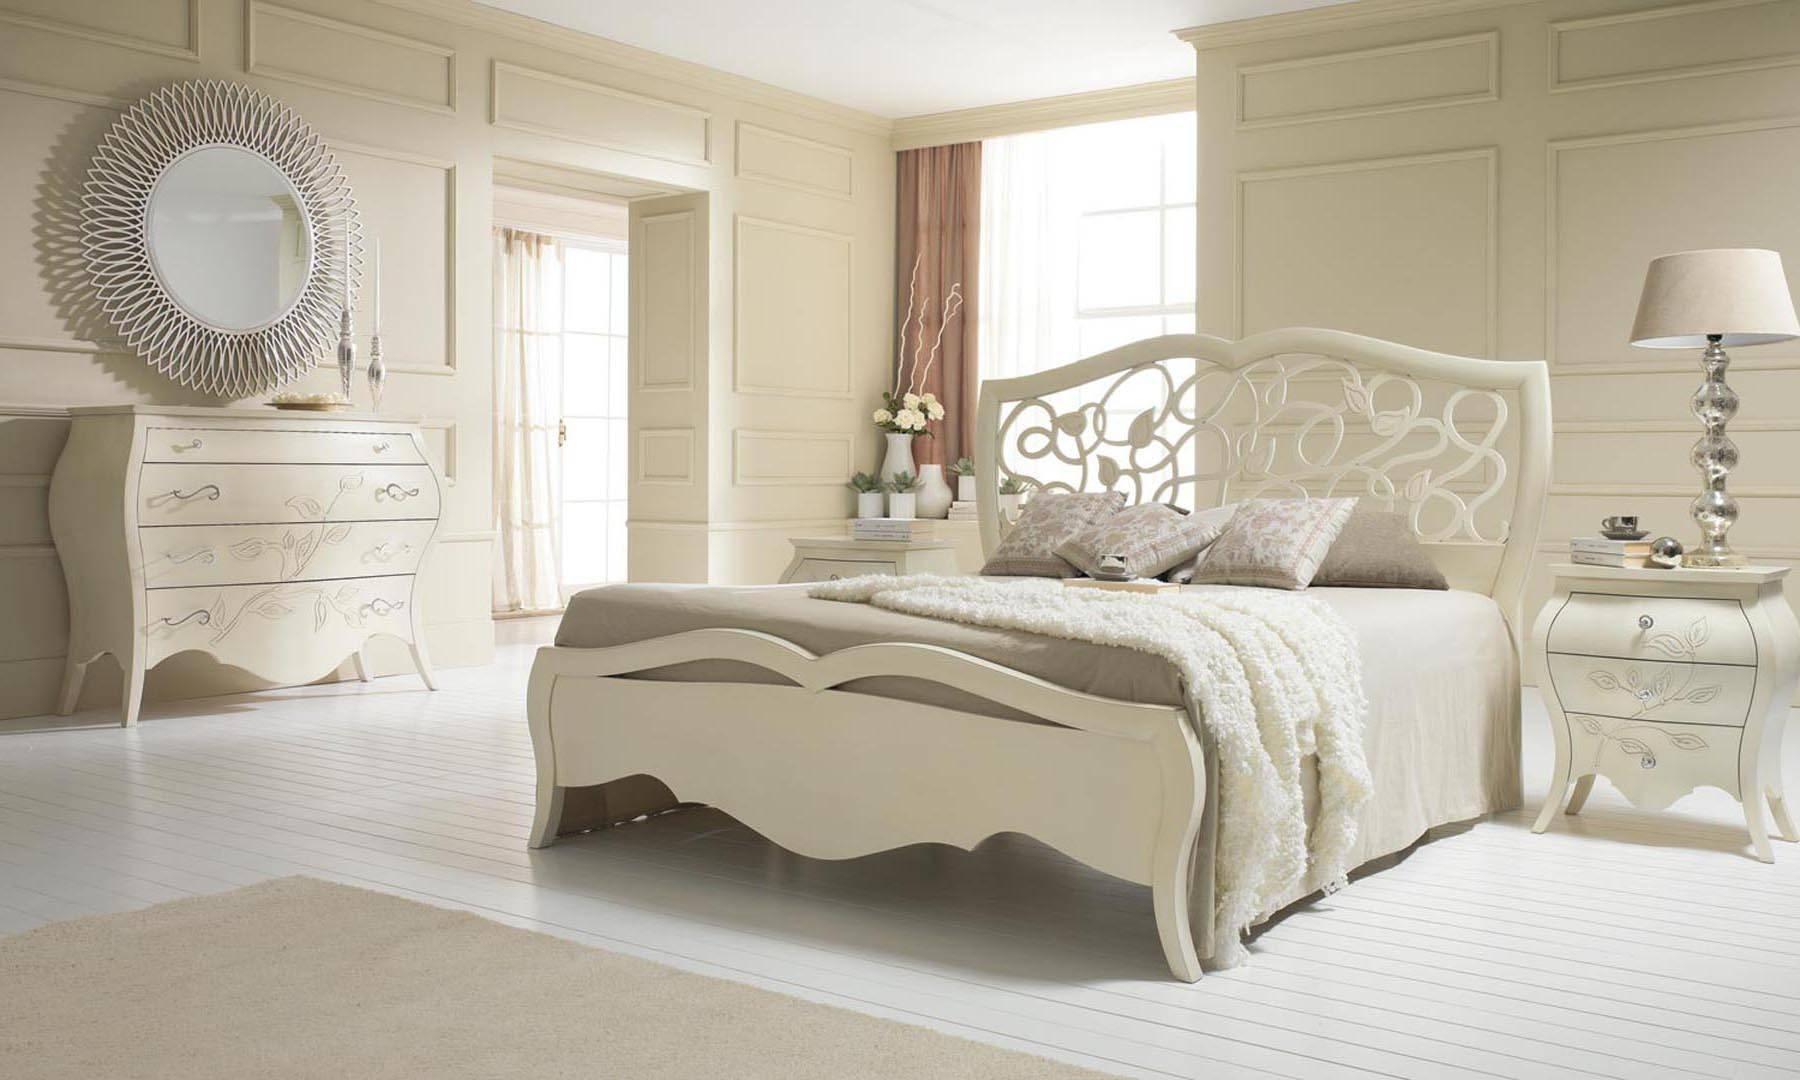 Accessori Per Camera Da Letto Bianca : Categorie camere da letto cucine arredamenti